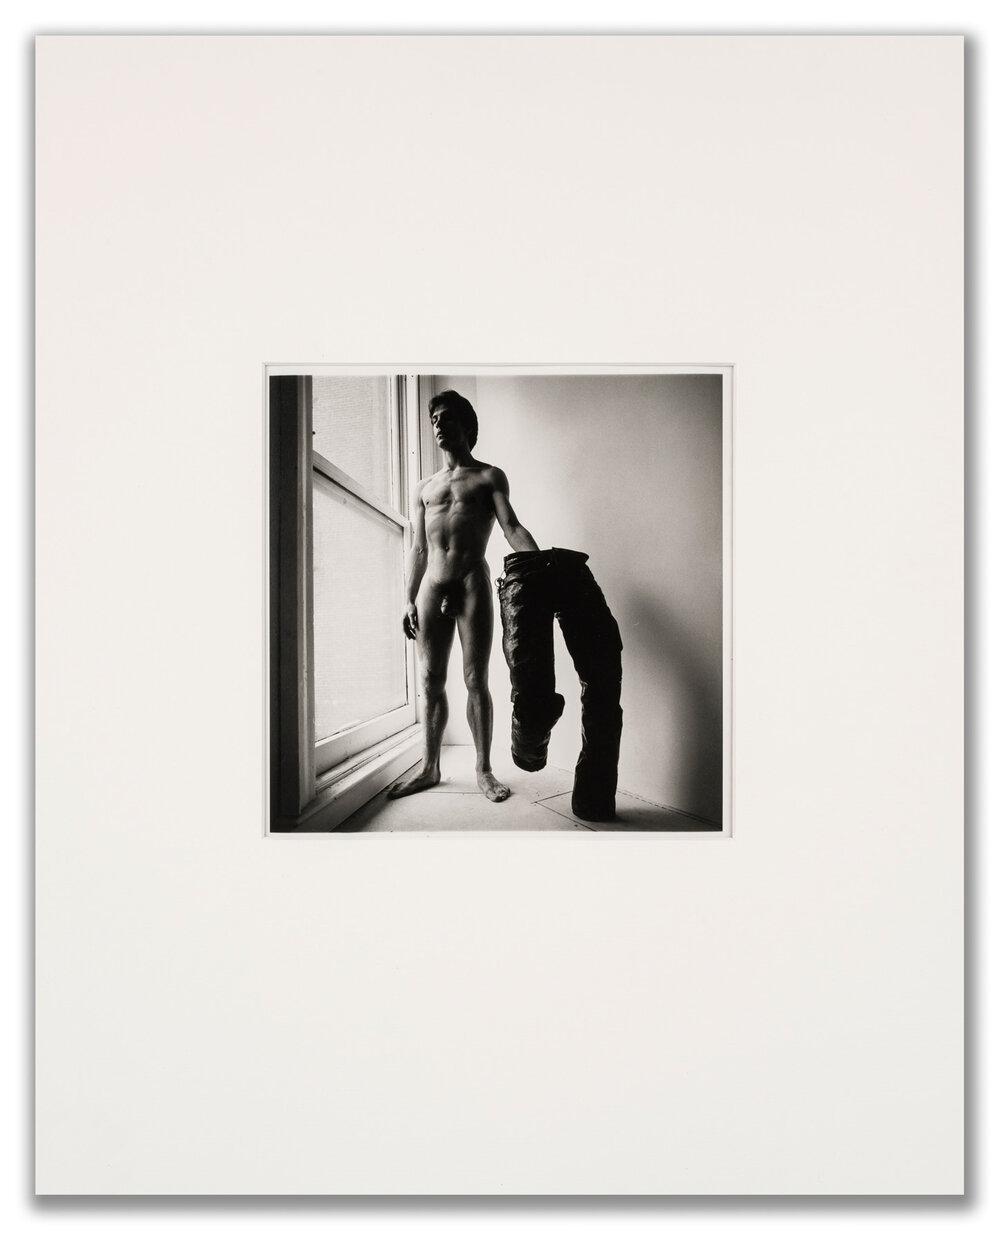 Arthur Tress, (American b.1940), Man with Trousers, c.1980.